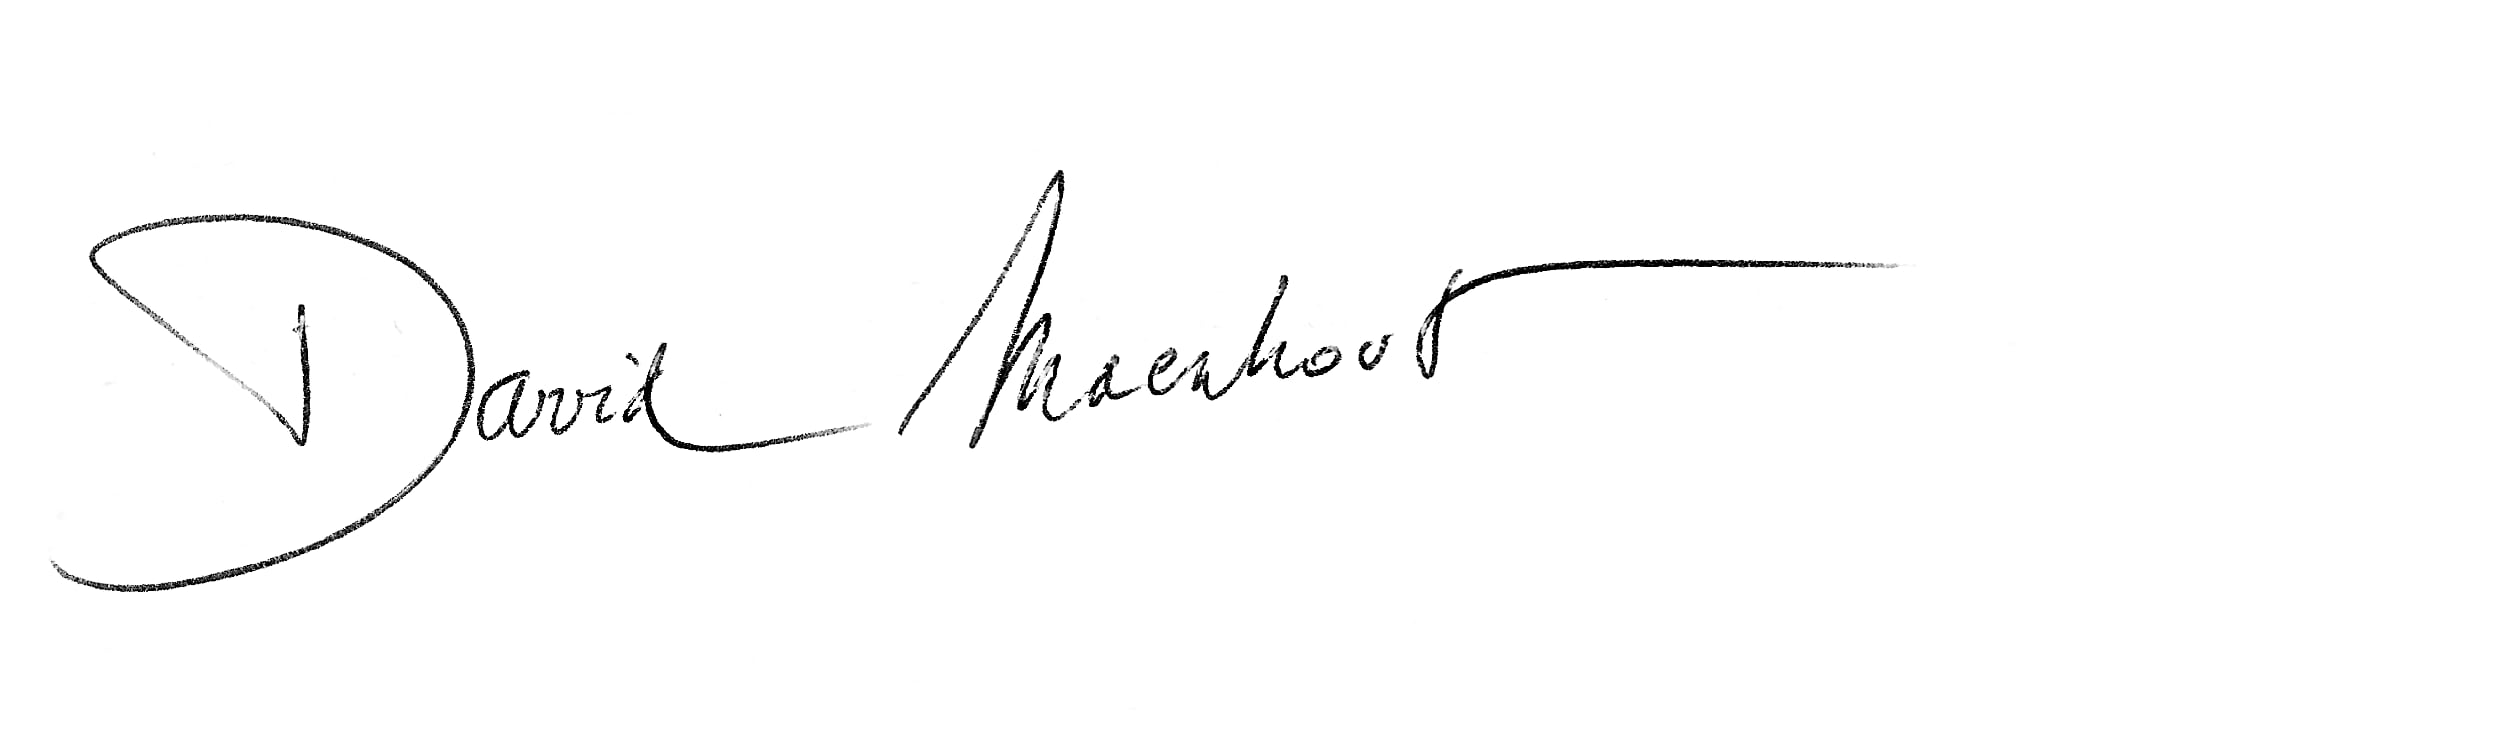 David Maenhout signature